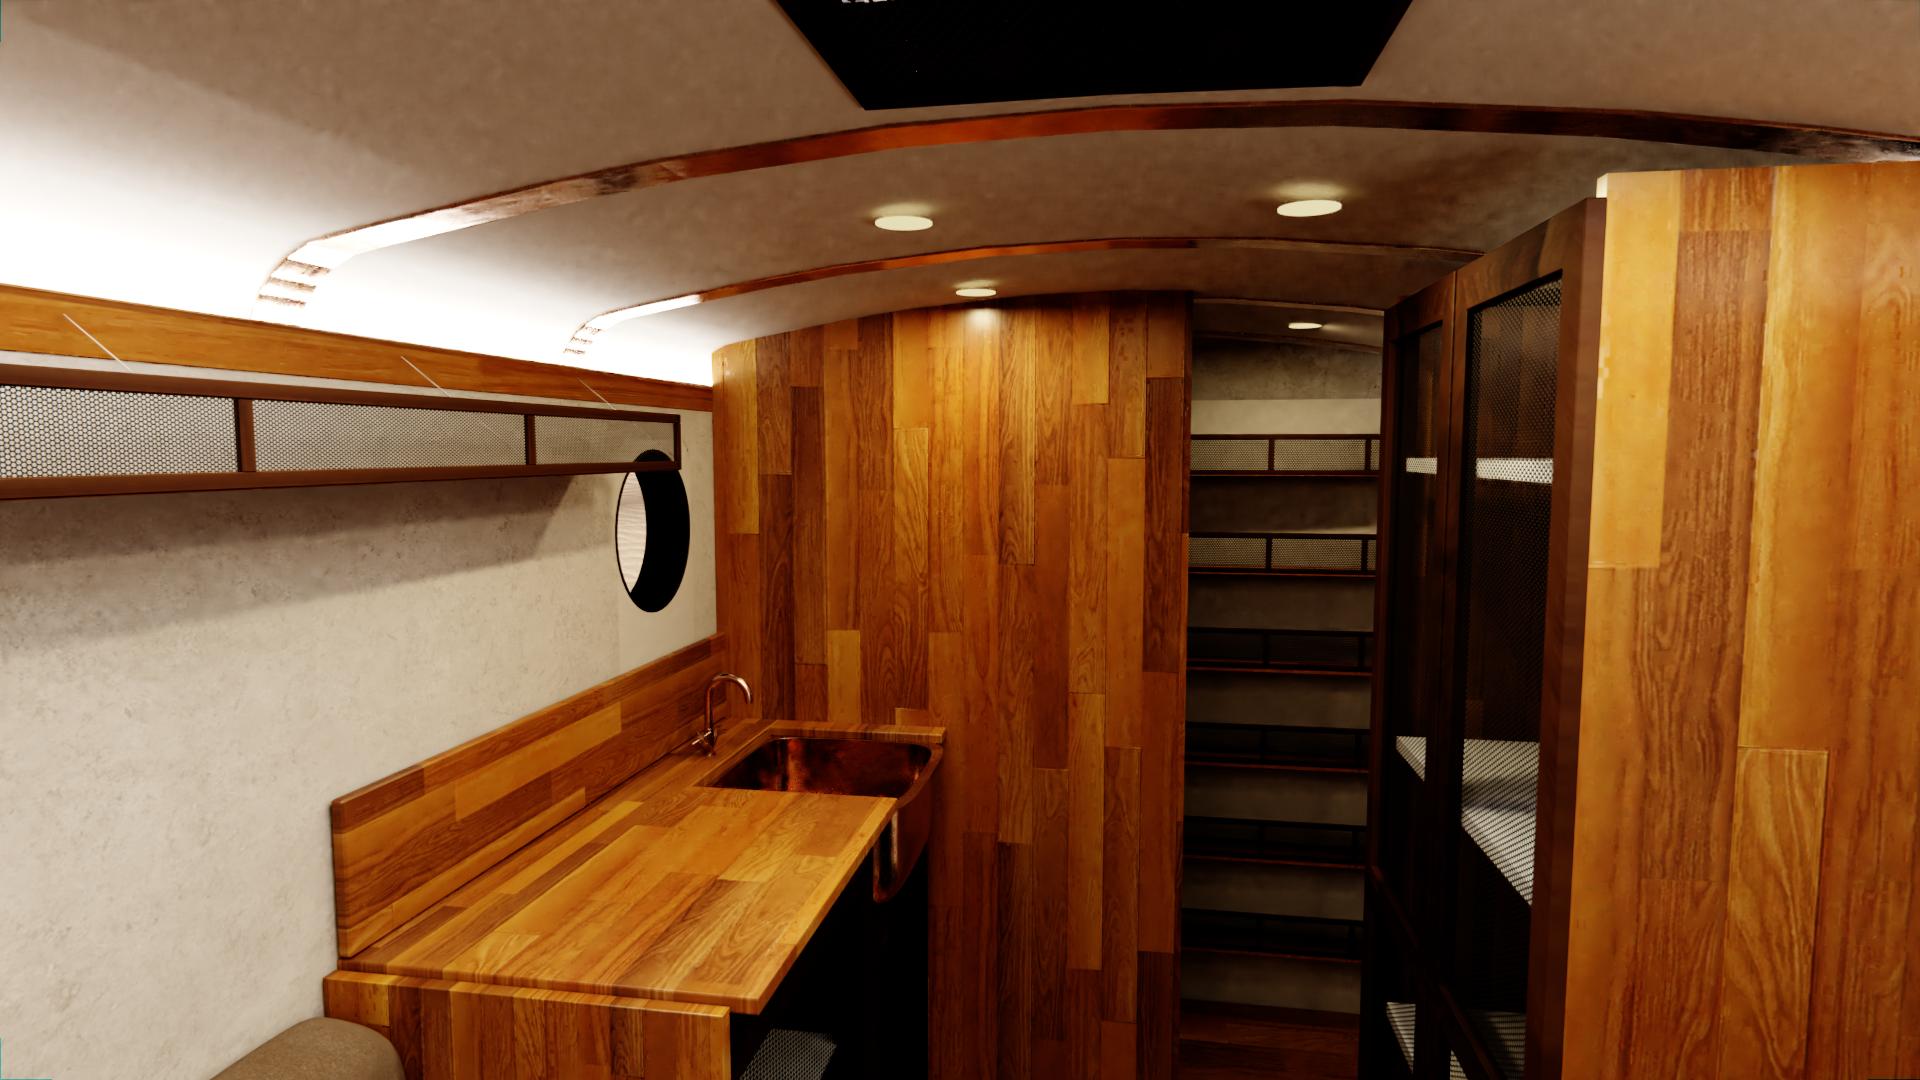 Interior design thinking